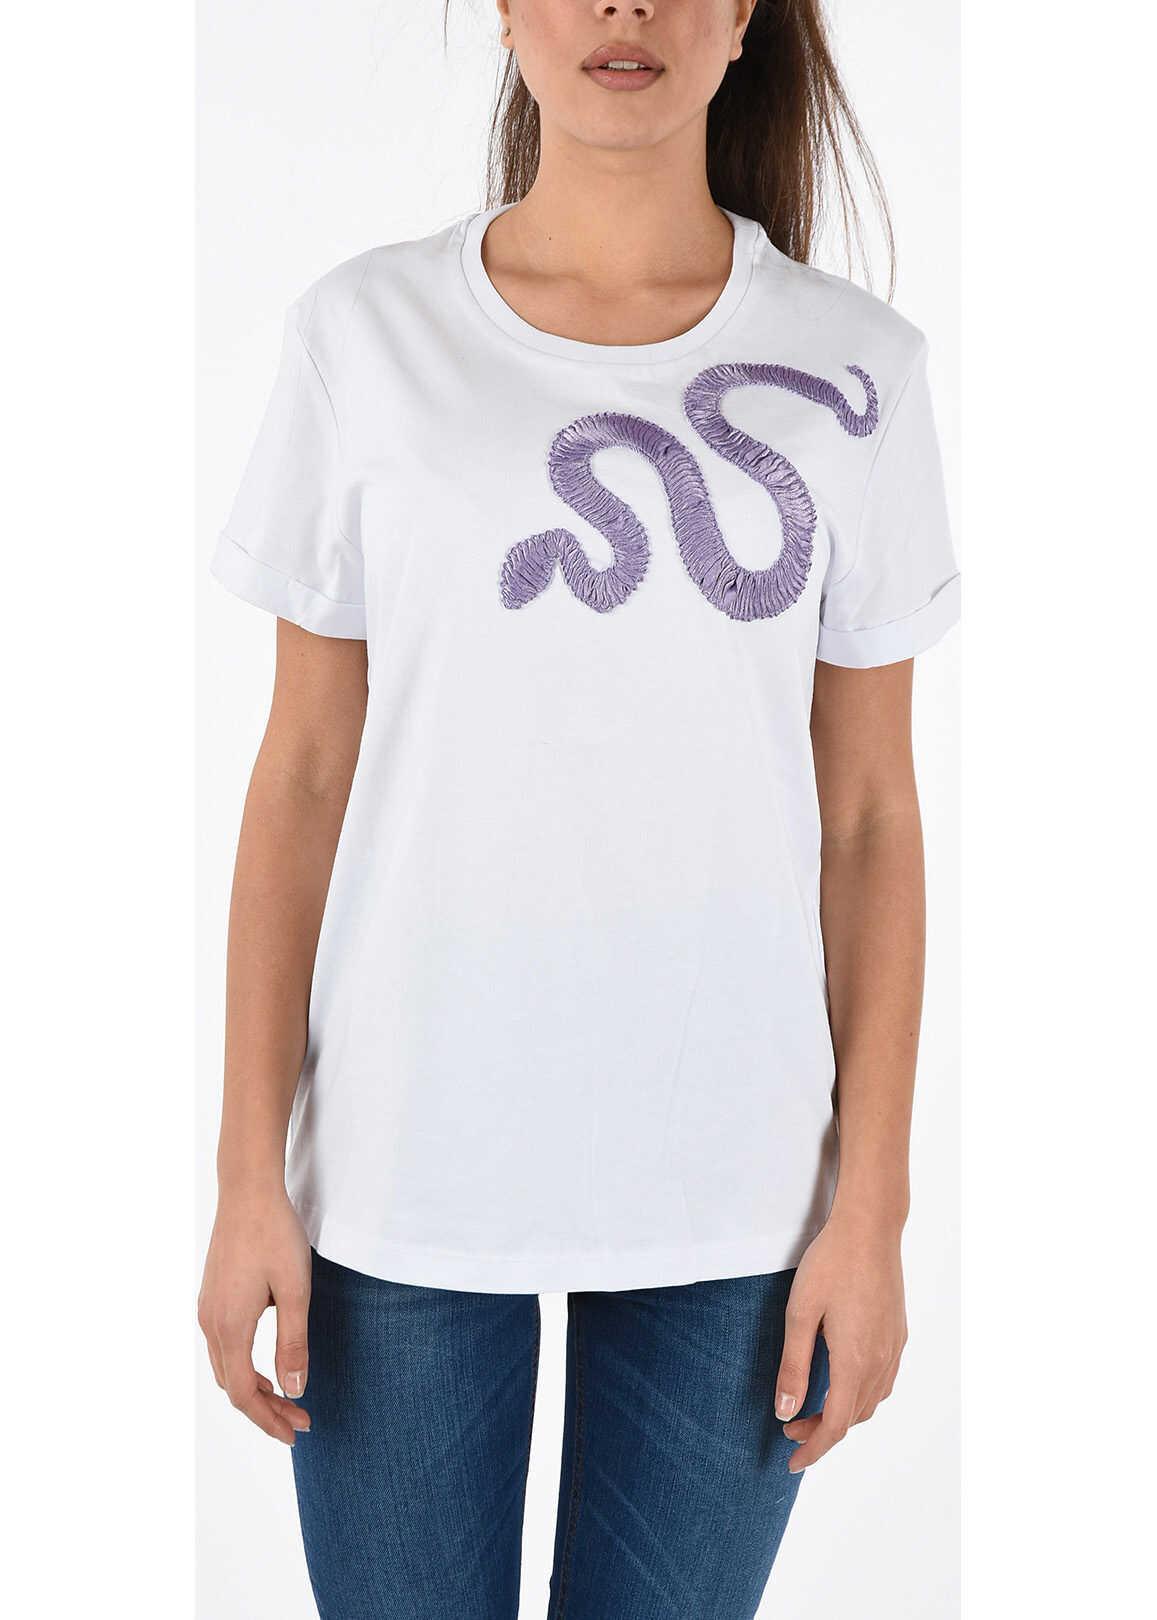 Just Cavalli Embroidered Crewneck T-shirt WHITE